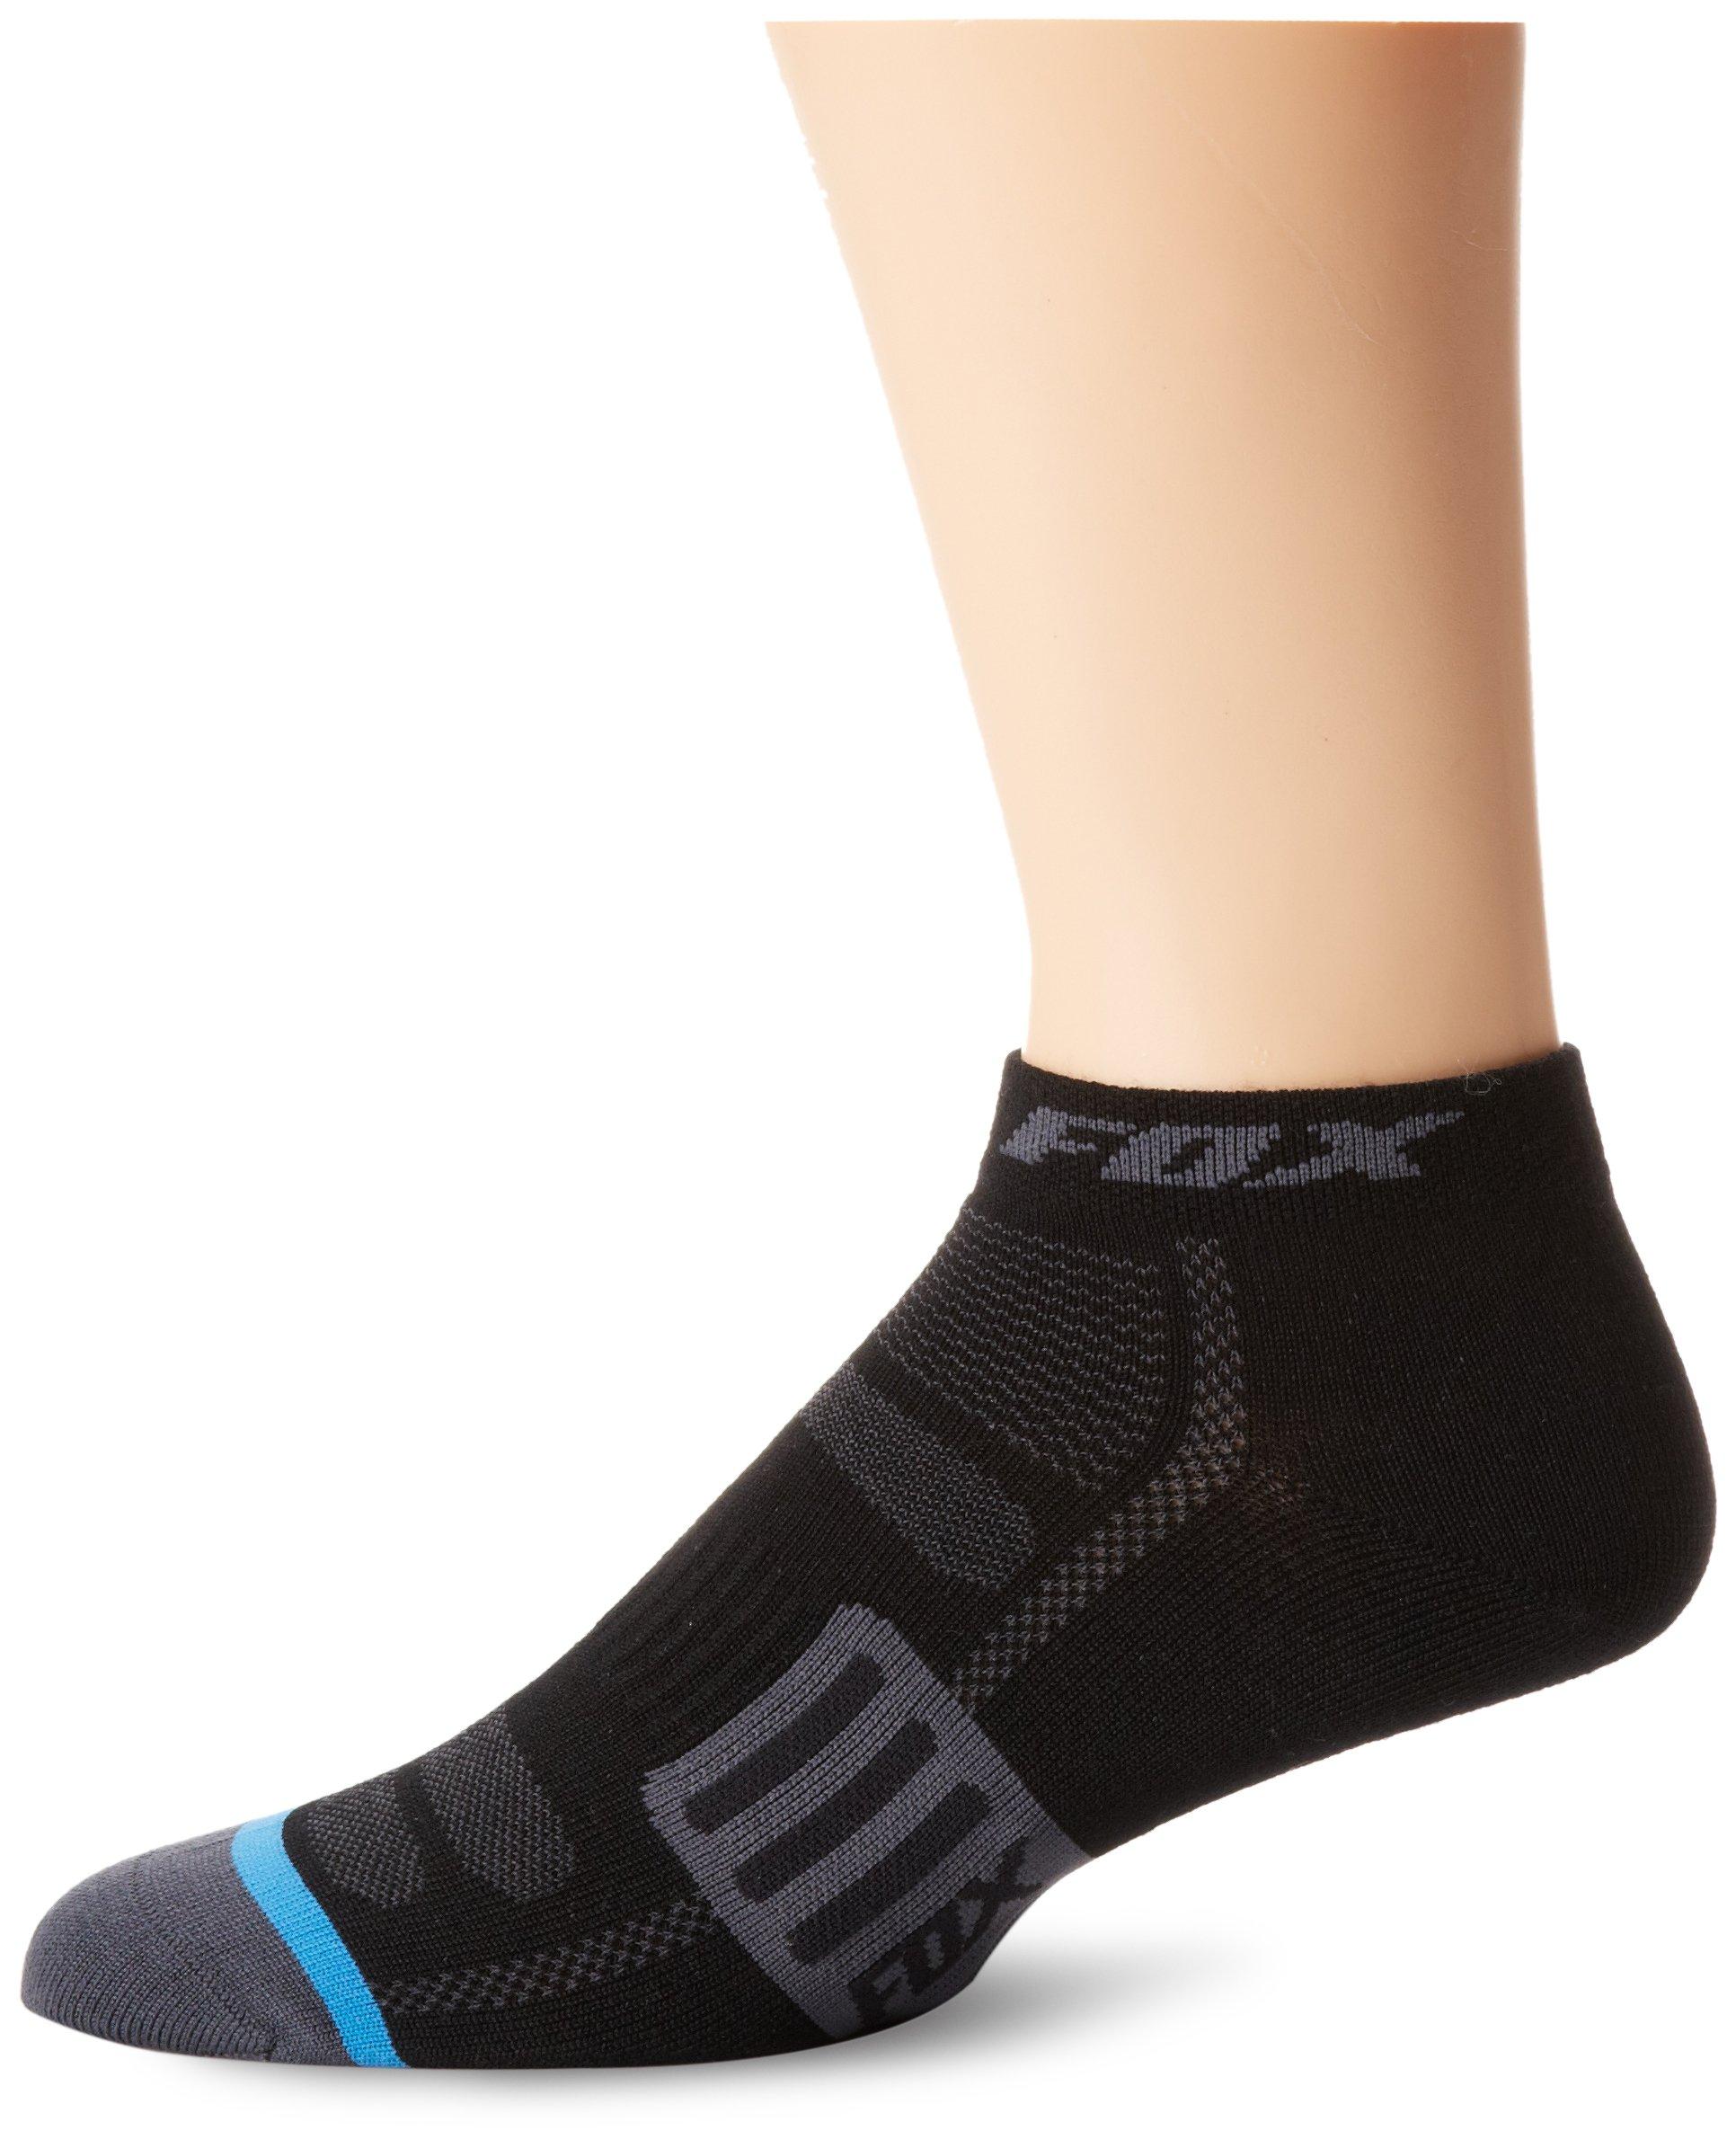 Fox Head Men's 2-Inch Merino Wool Socks, Black, Large/X-Large